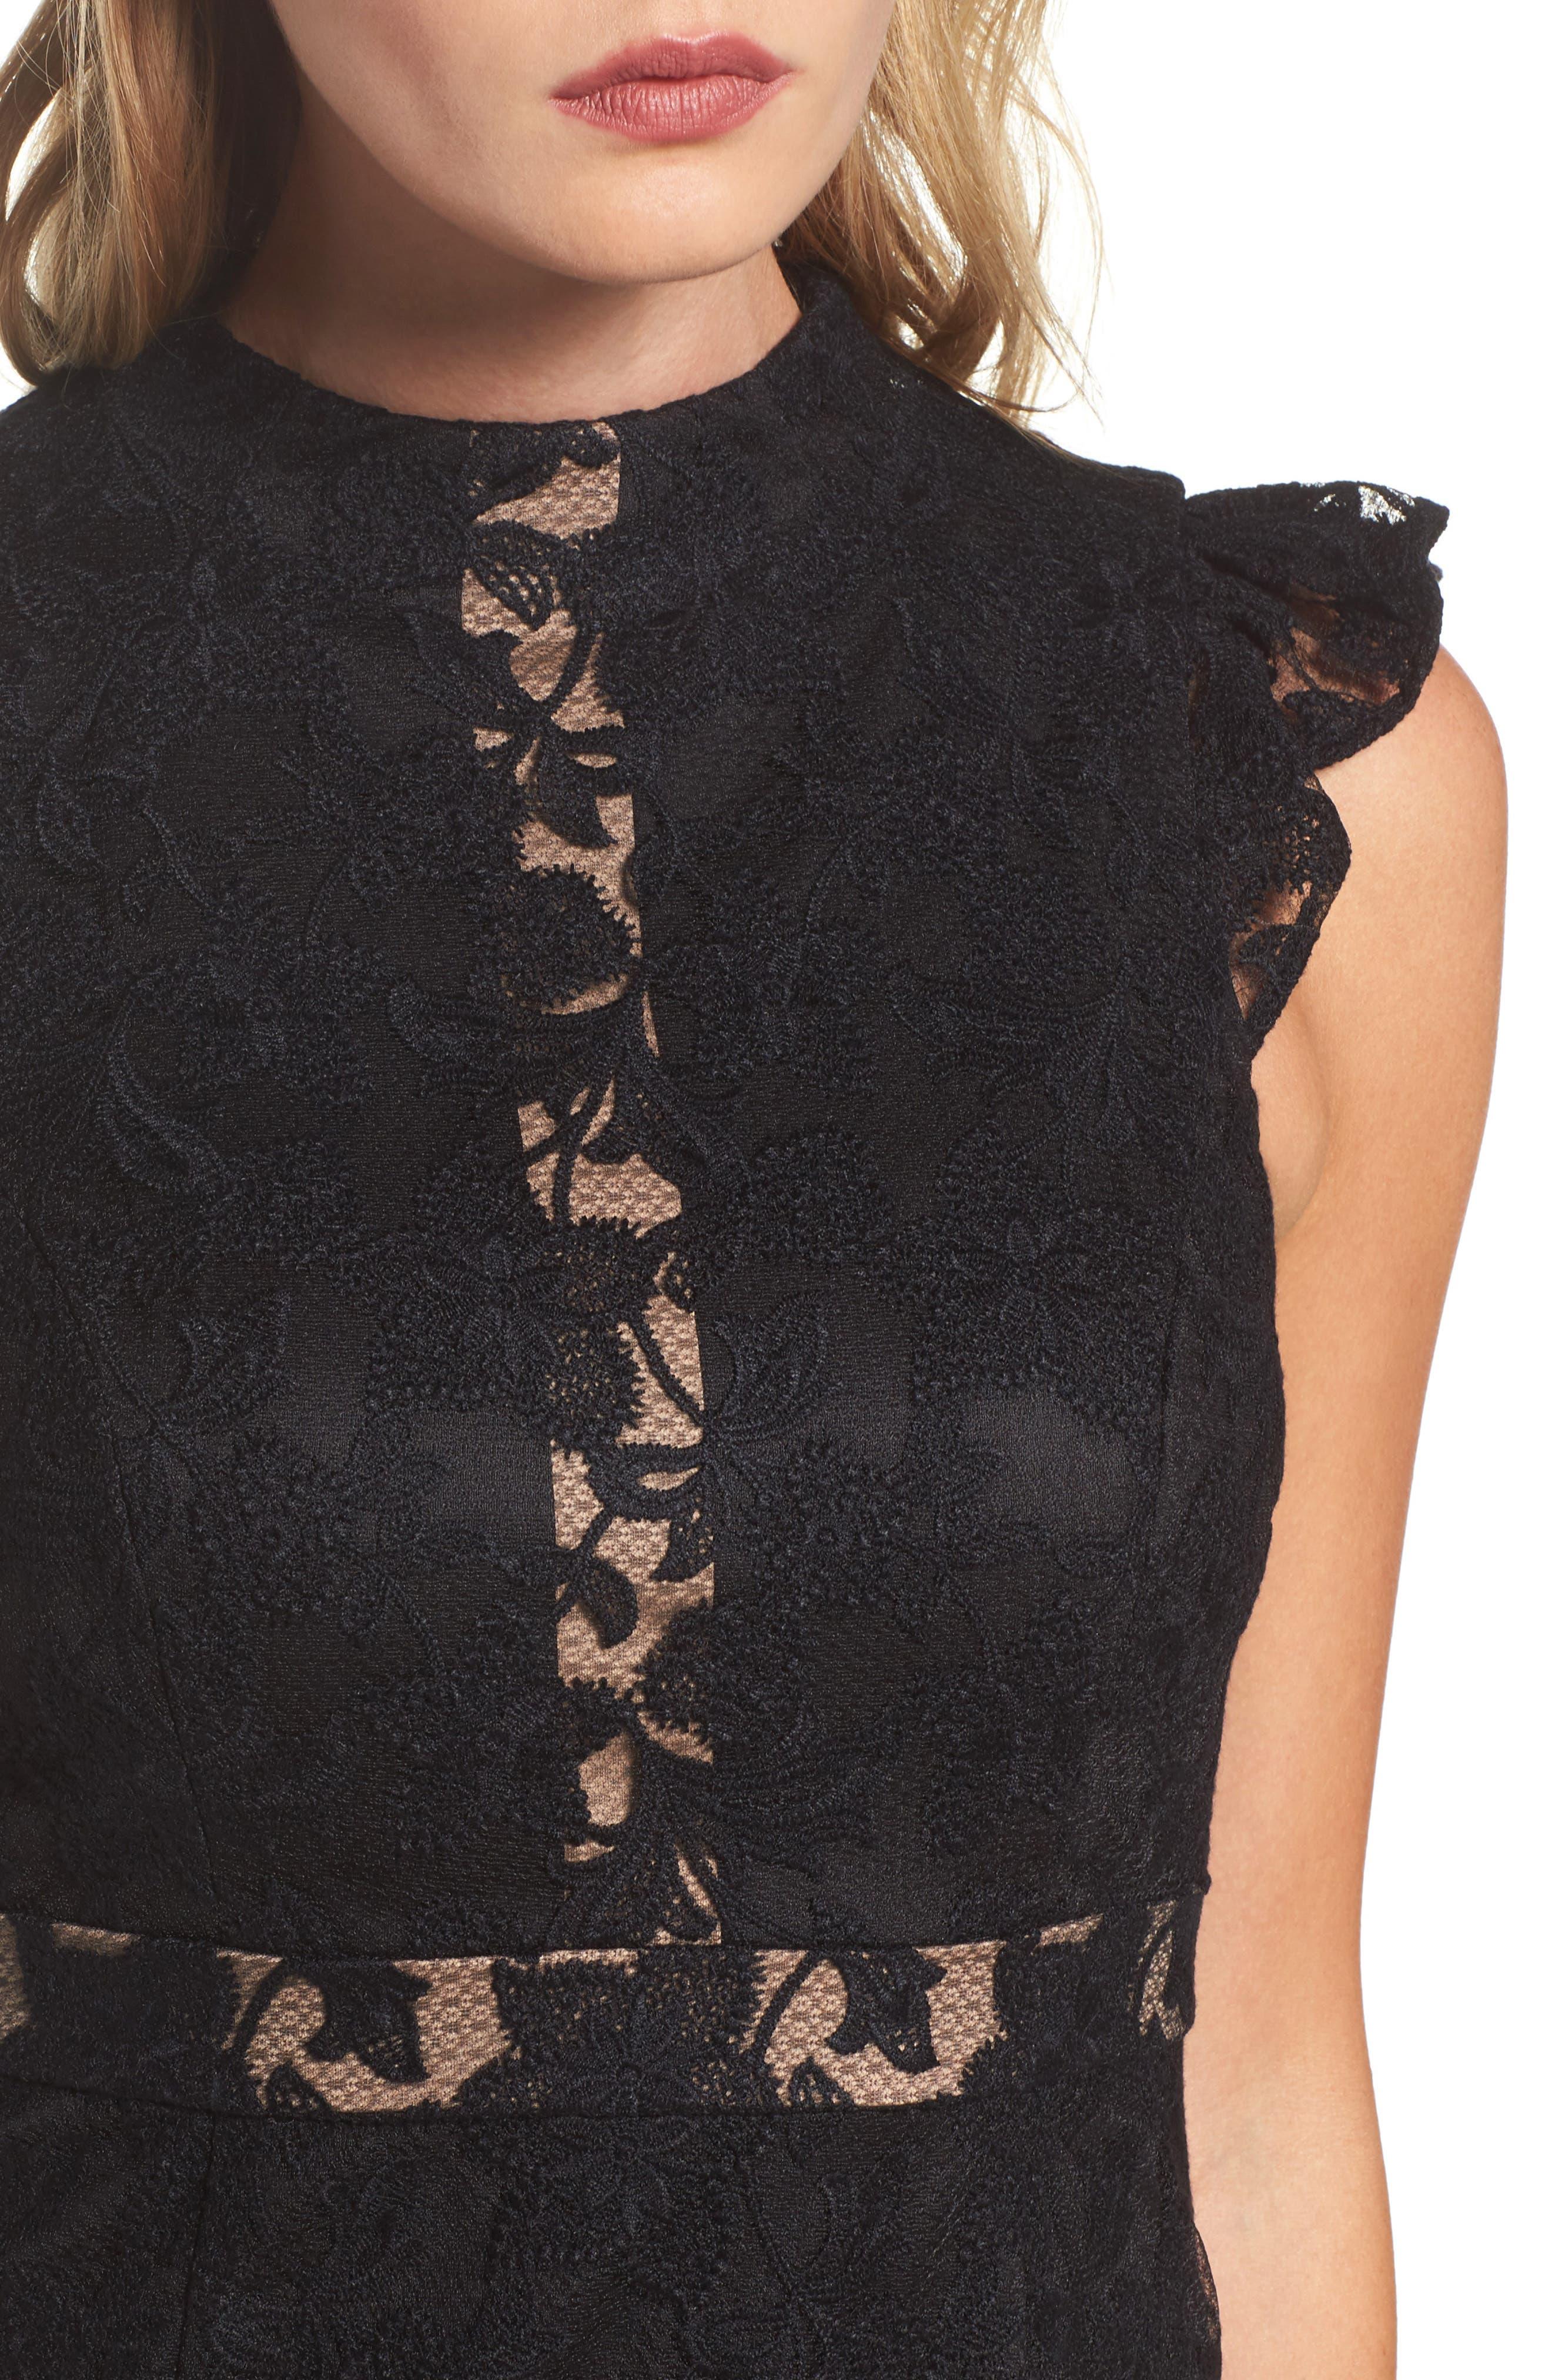 Salmone Lace Sheath Dress,                             Alternate thumbnail 4, color,                             Black/ Nude